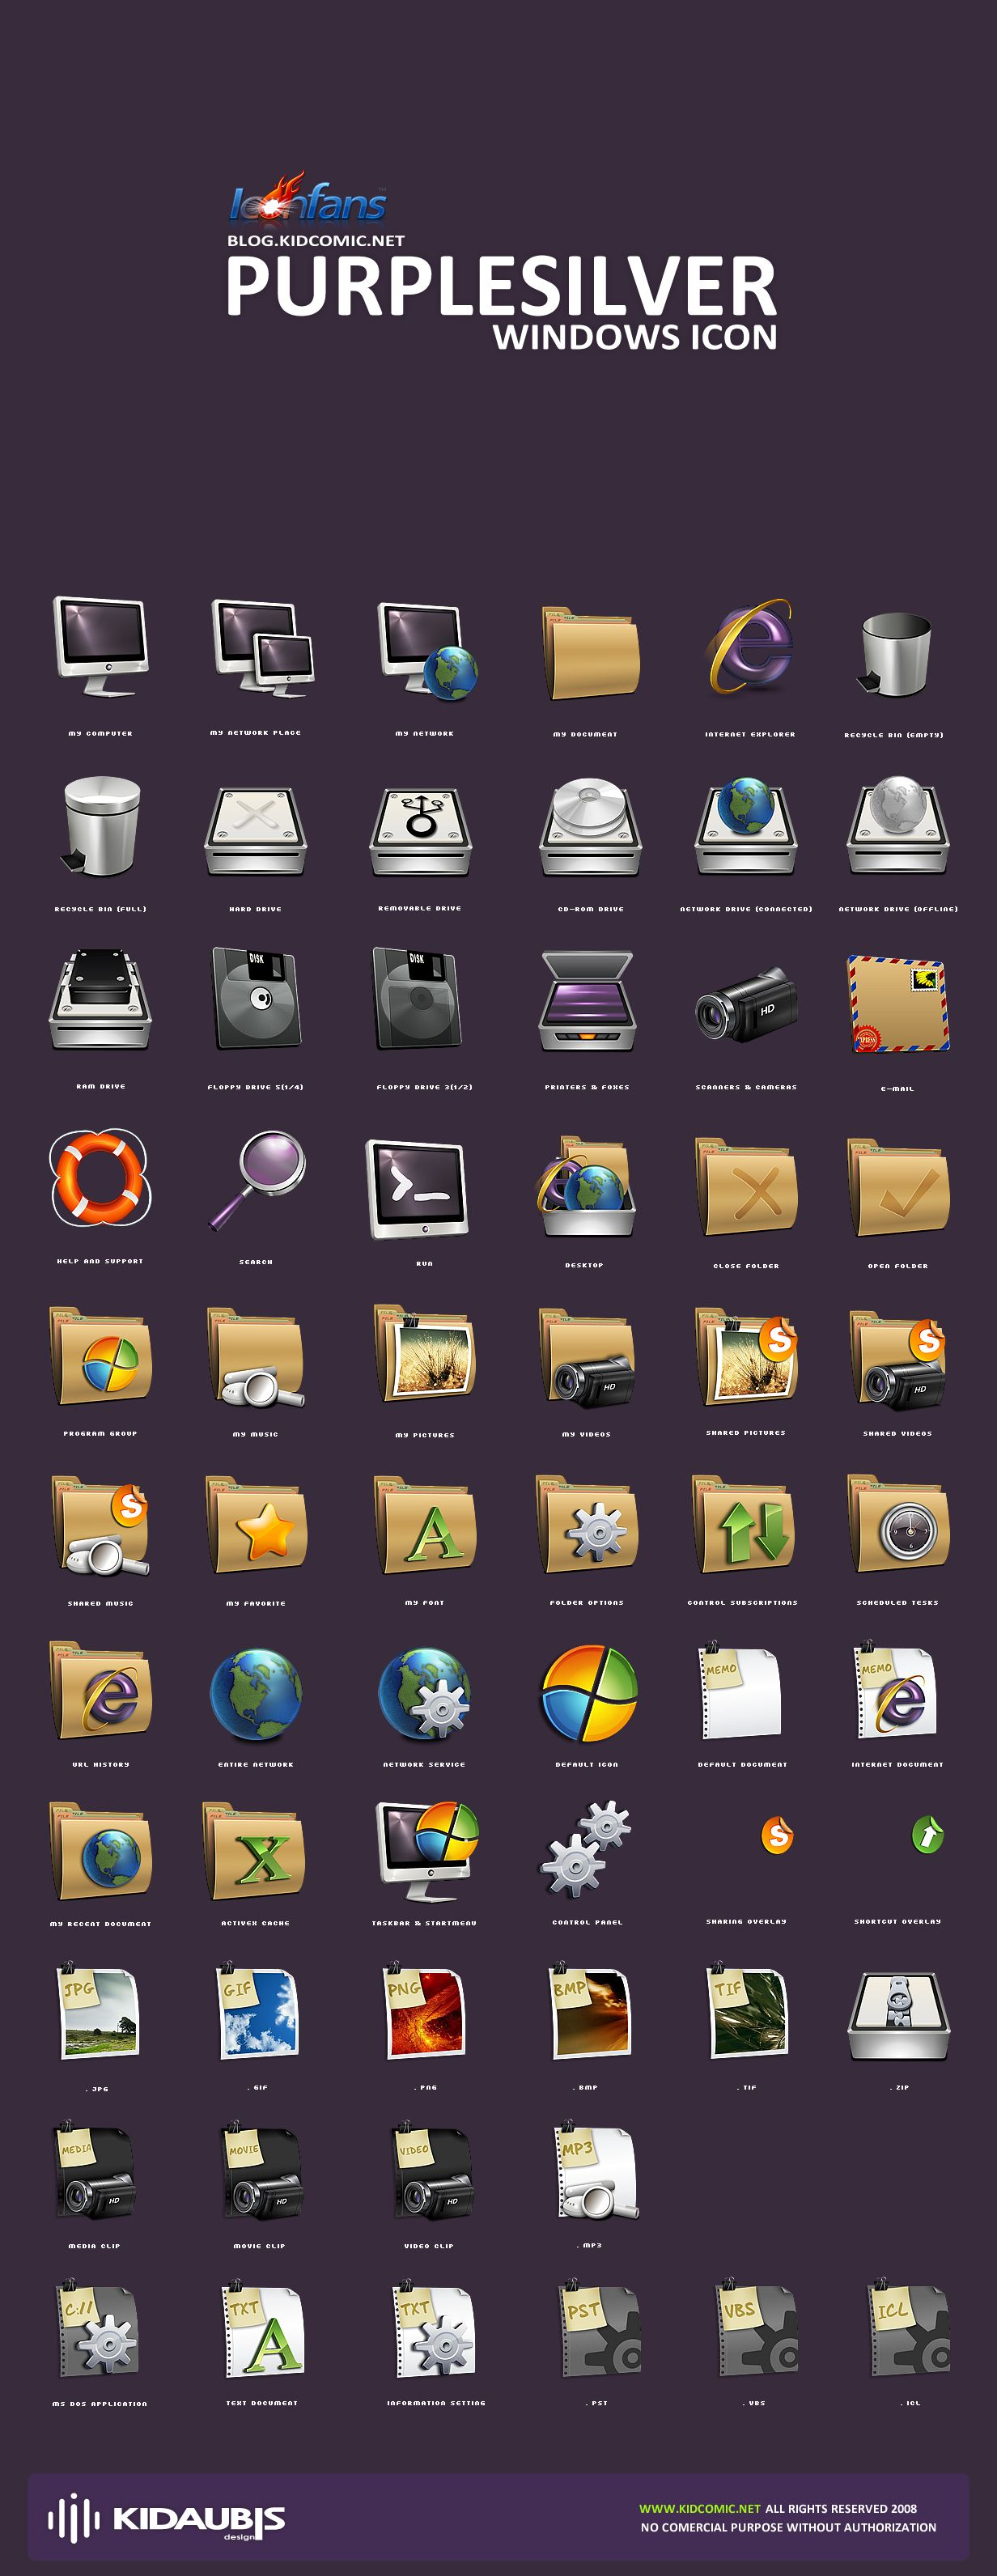 Free Purplesilver windows icons